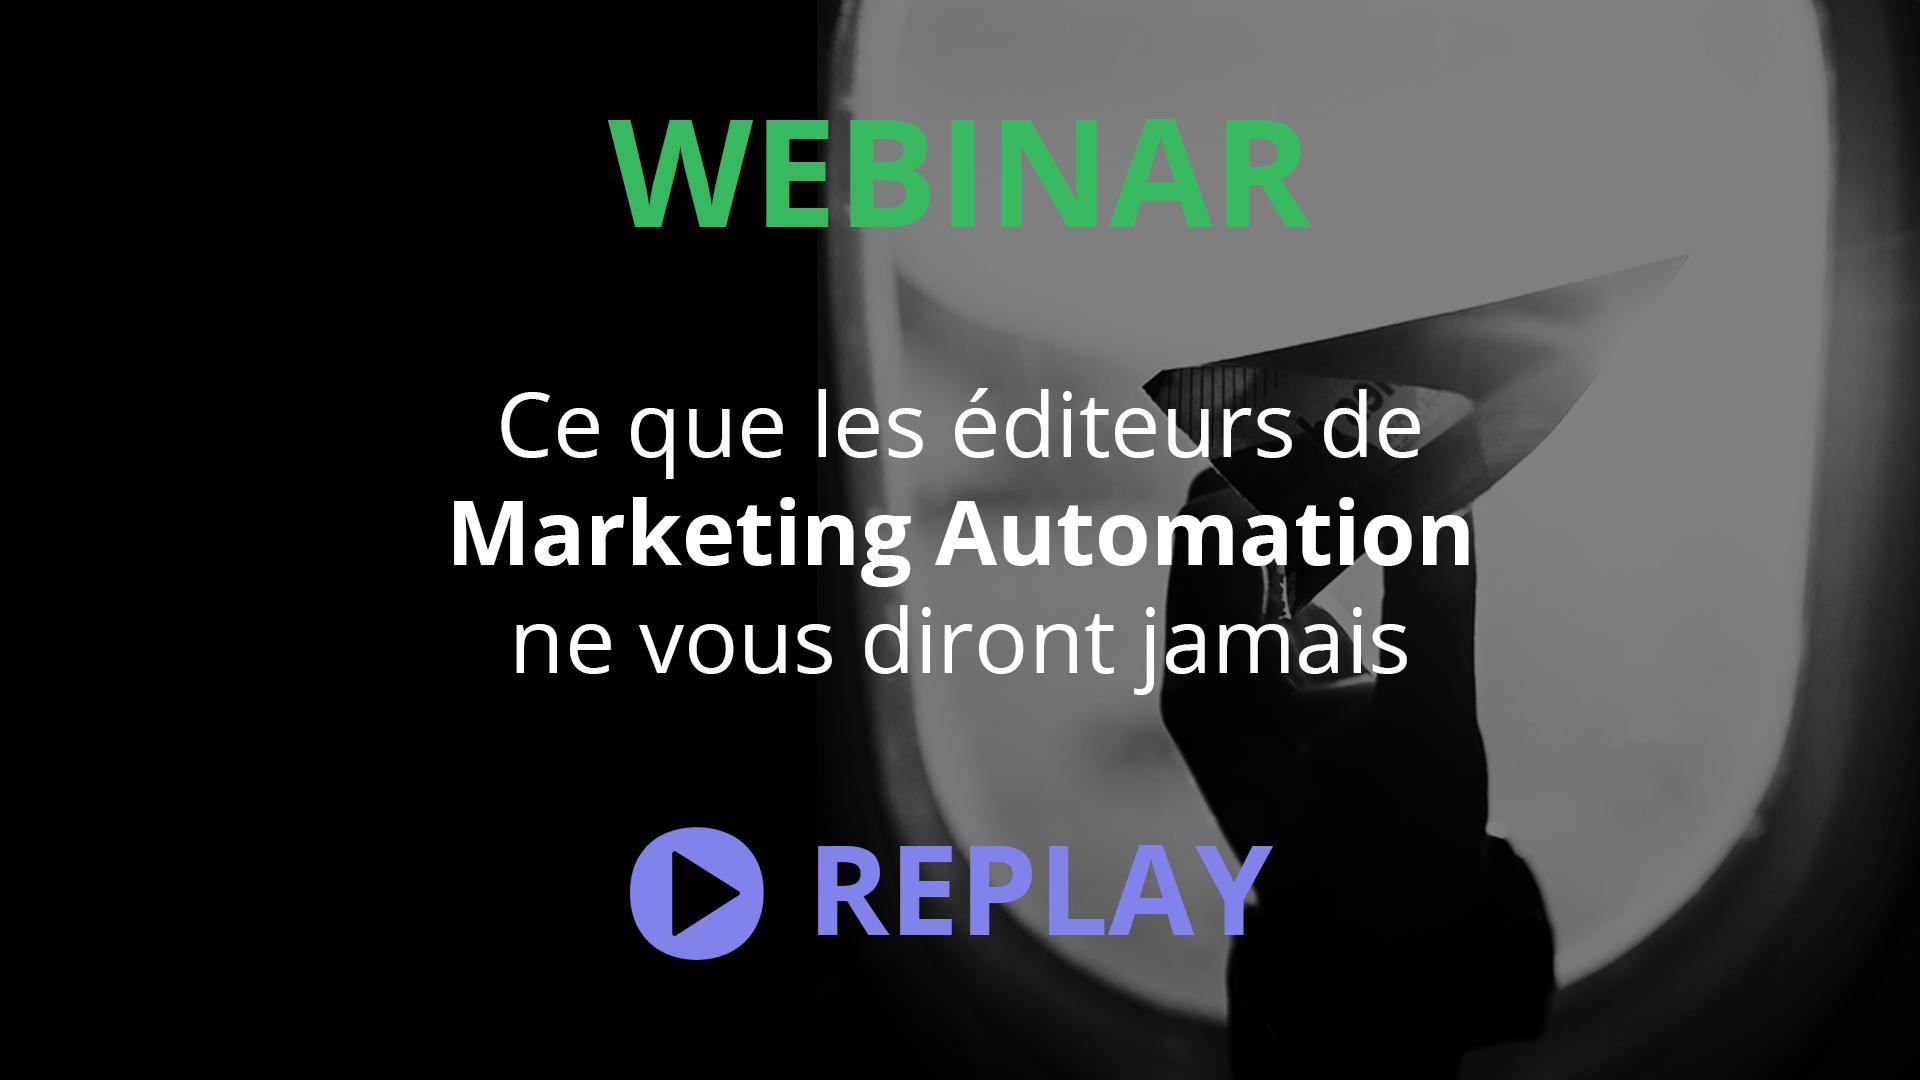 Webinar Kestio : Marketing Automation